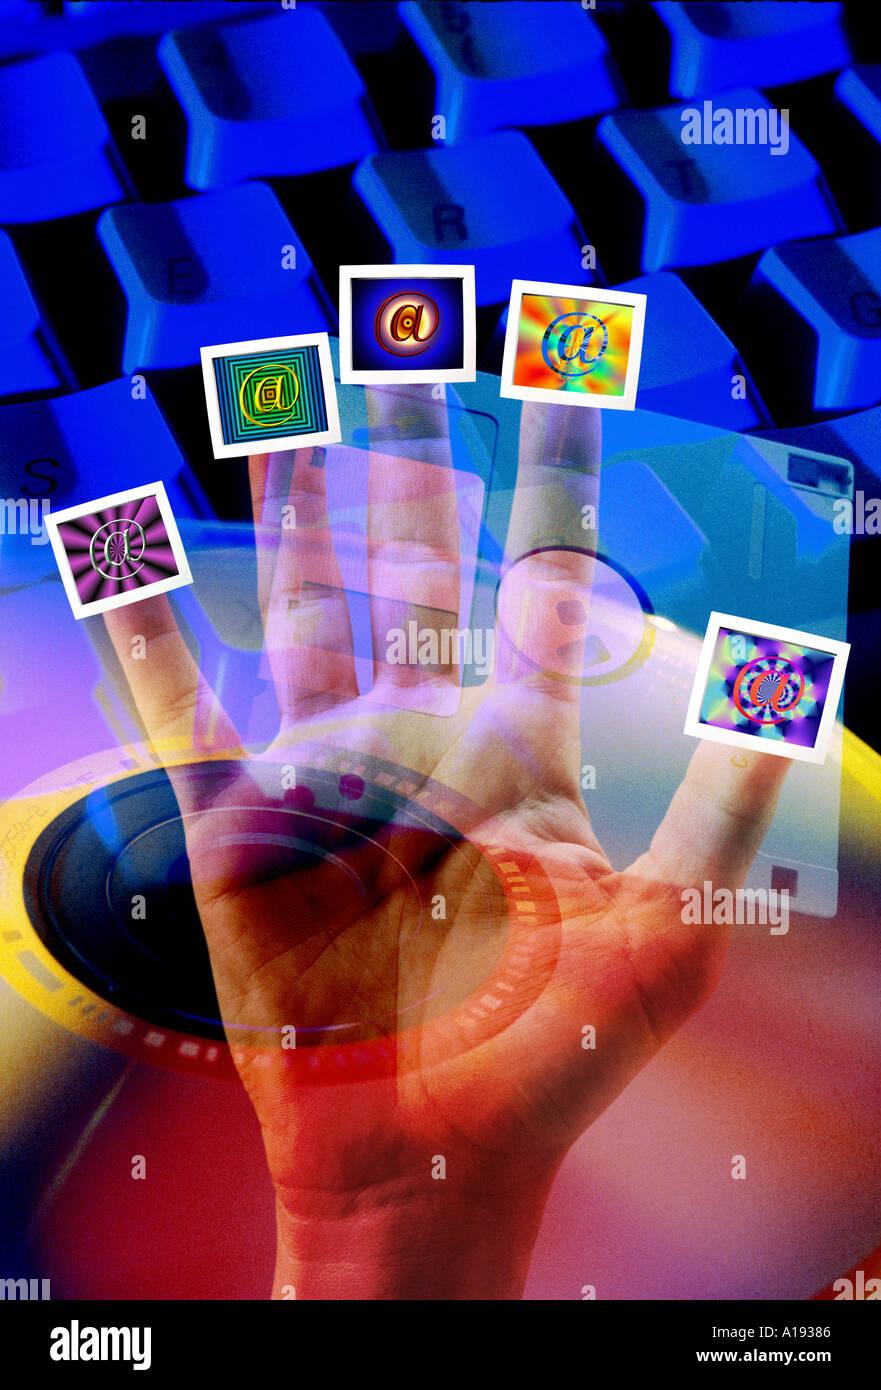 Concept internet Photo Stock